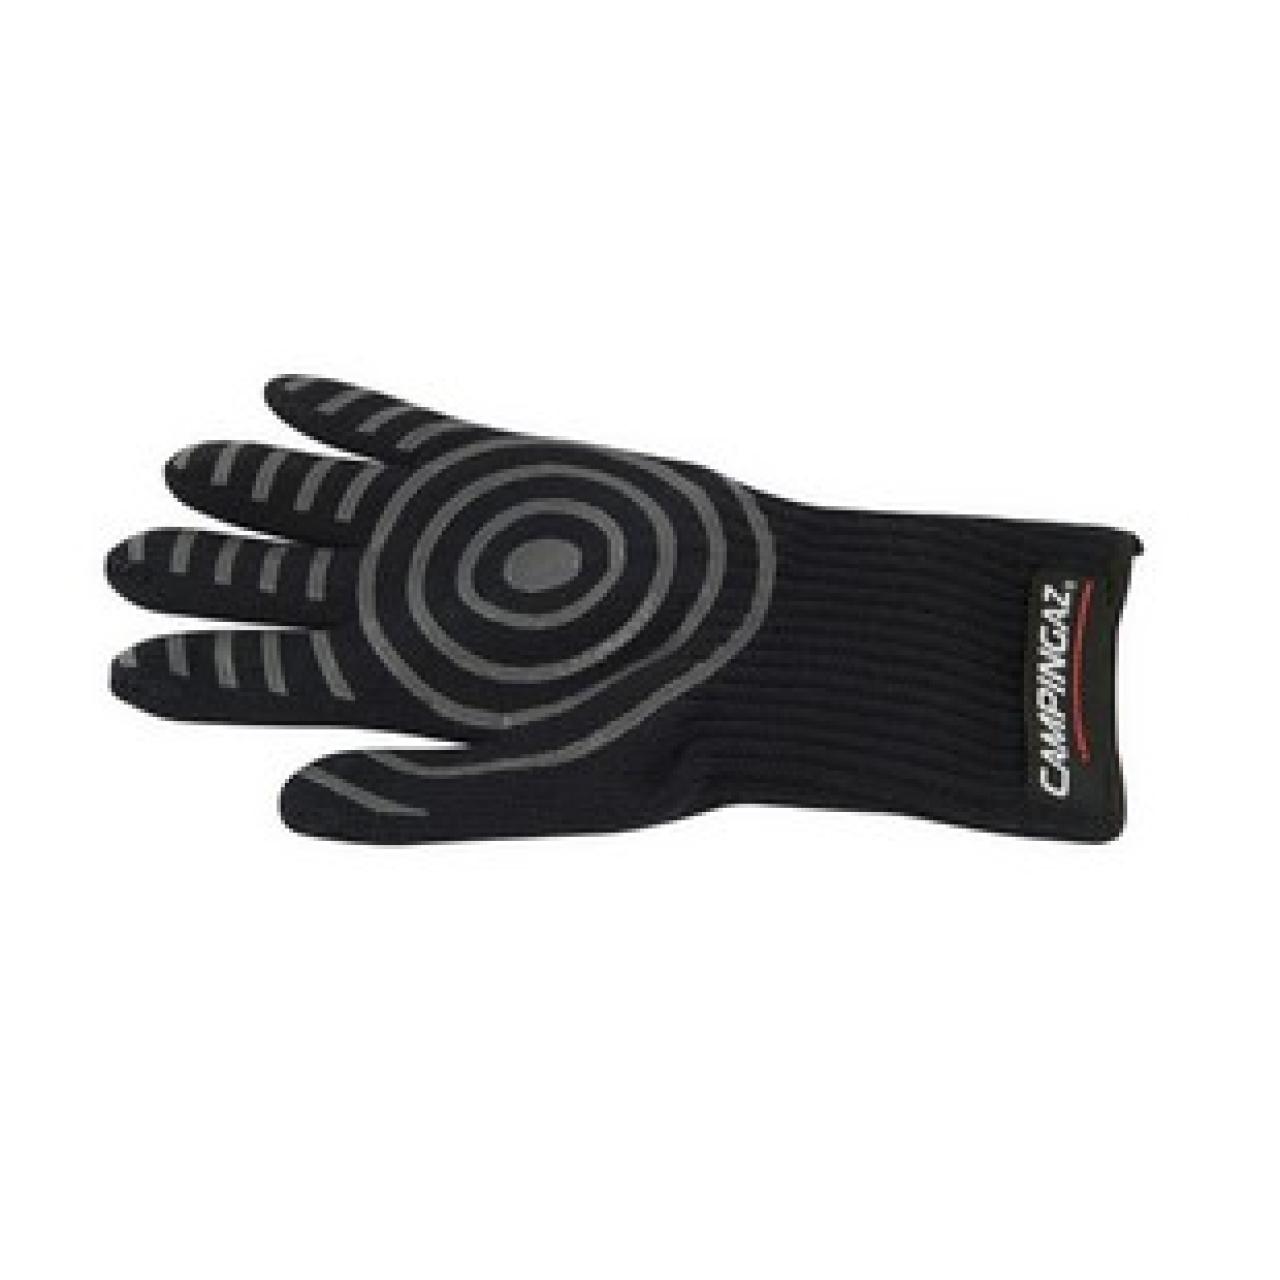 Premium Grill-Fingerhandschuh